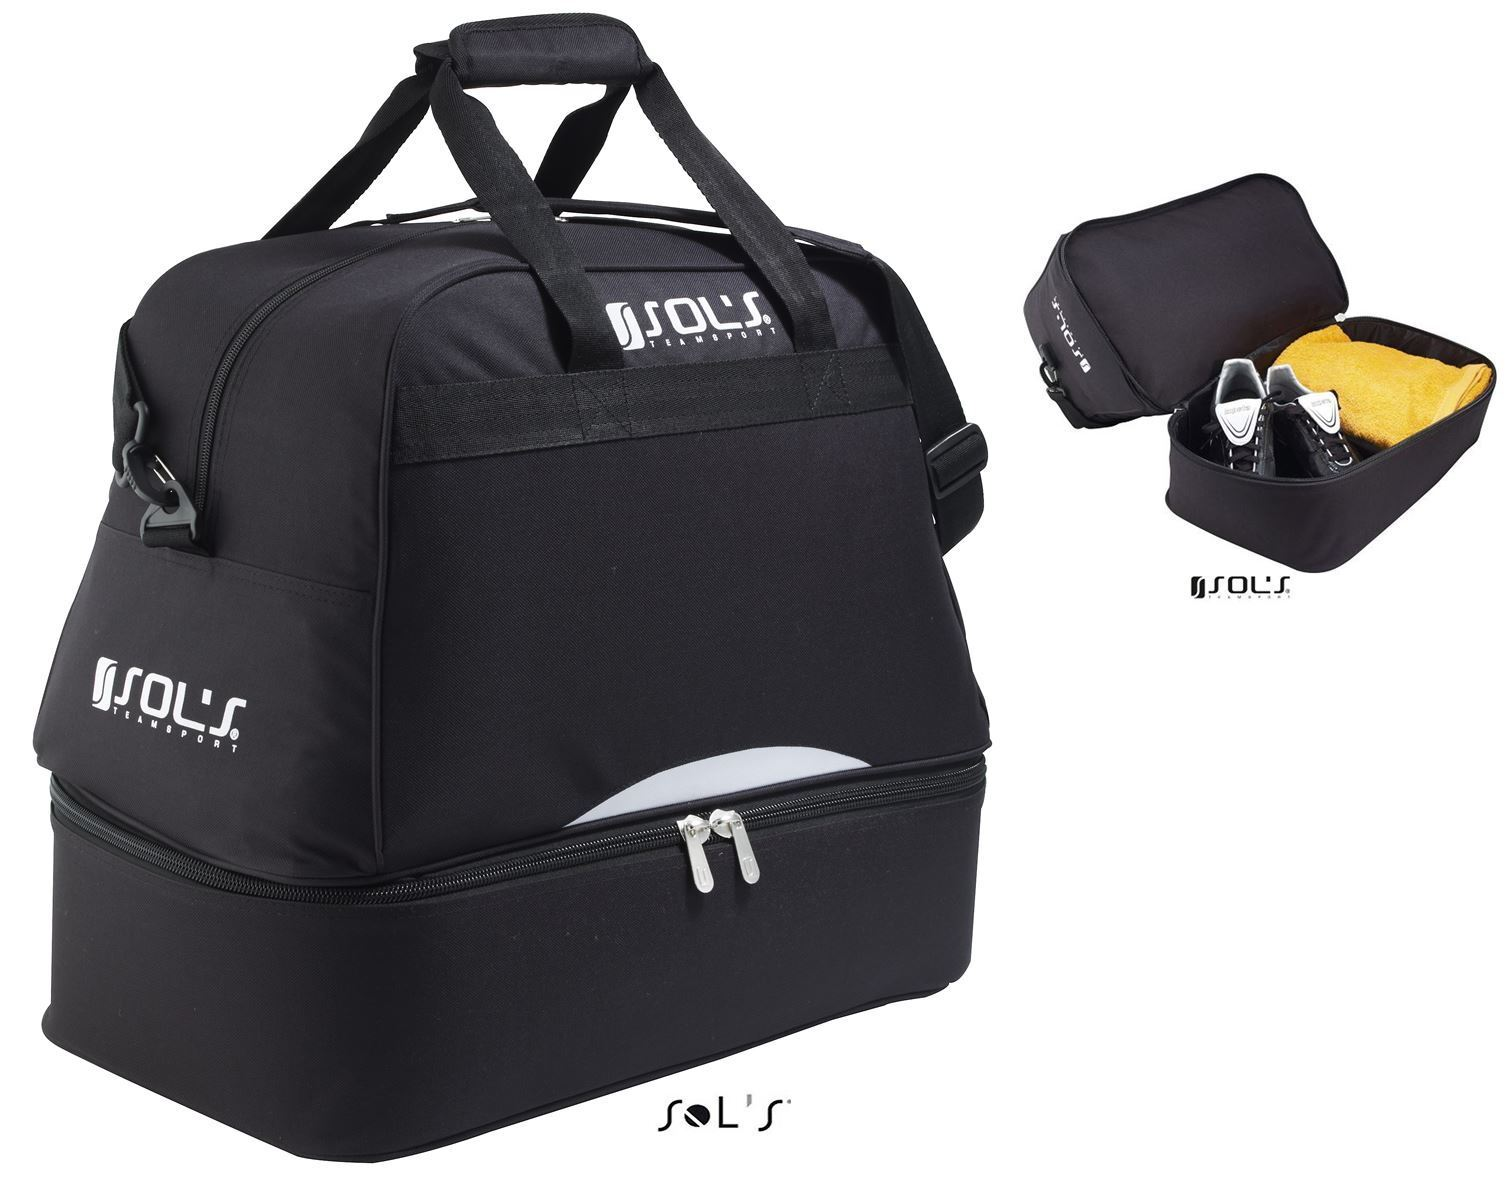 sol s calcio sports bag holdall shoe towel compartment